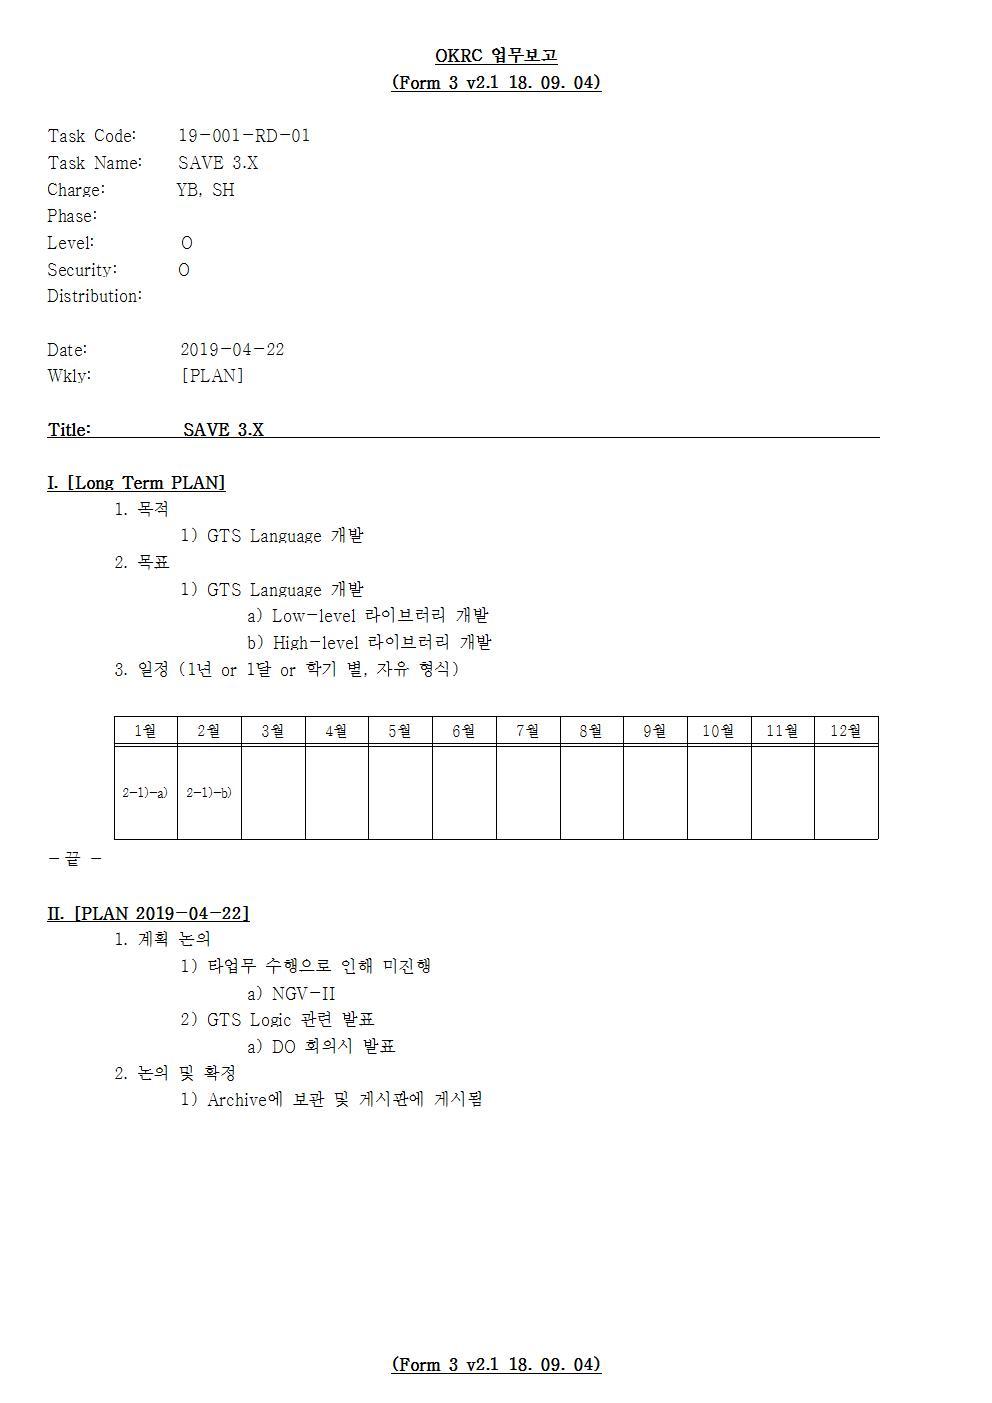 D-[19-001-RD-01]-[SAVE 3.X]-[2019-04-22][SH]001.jpg